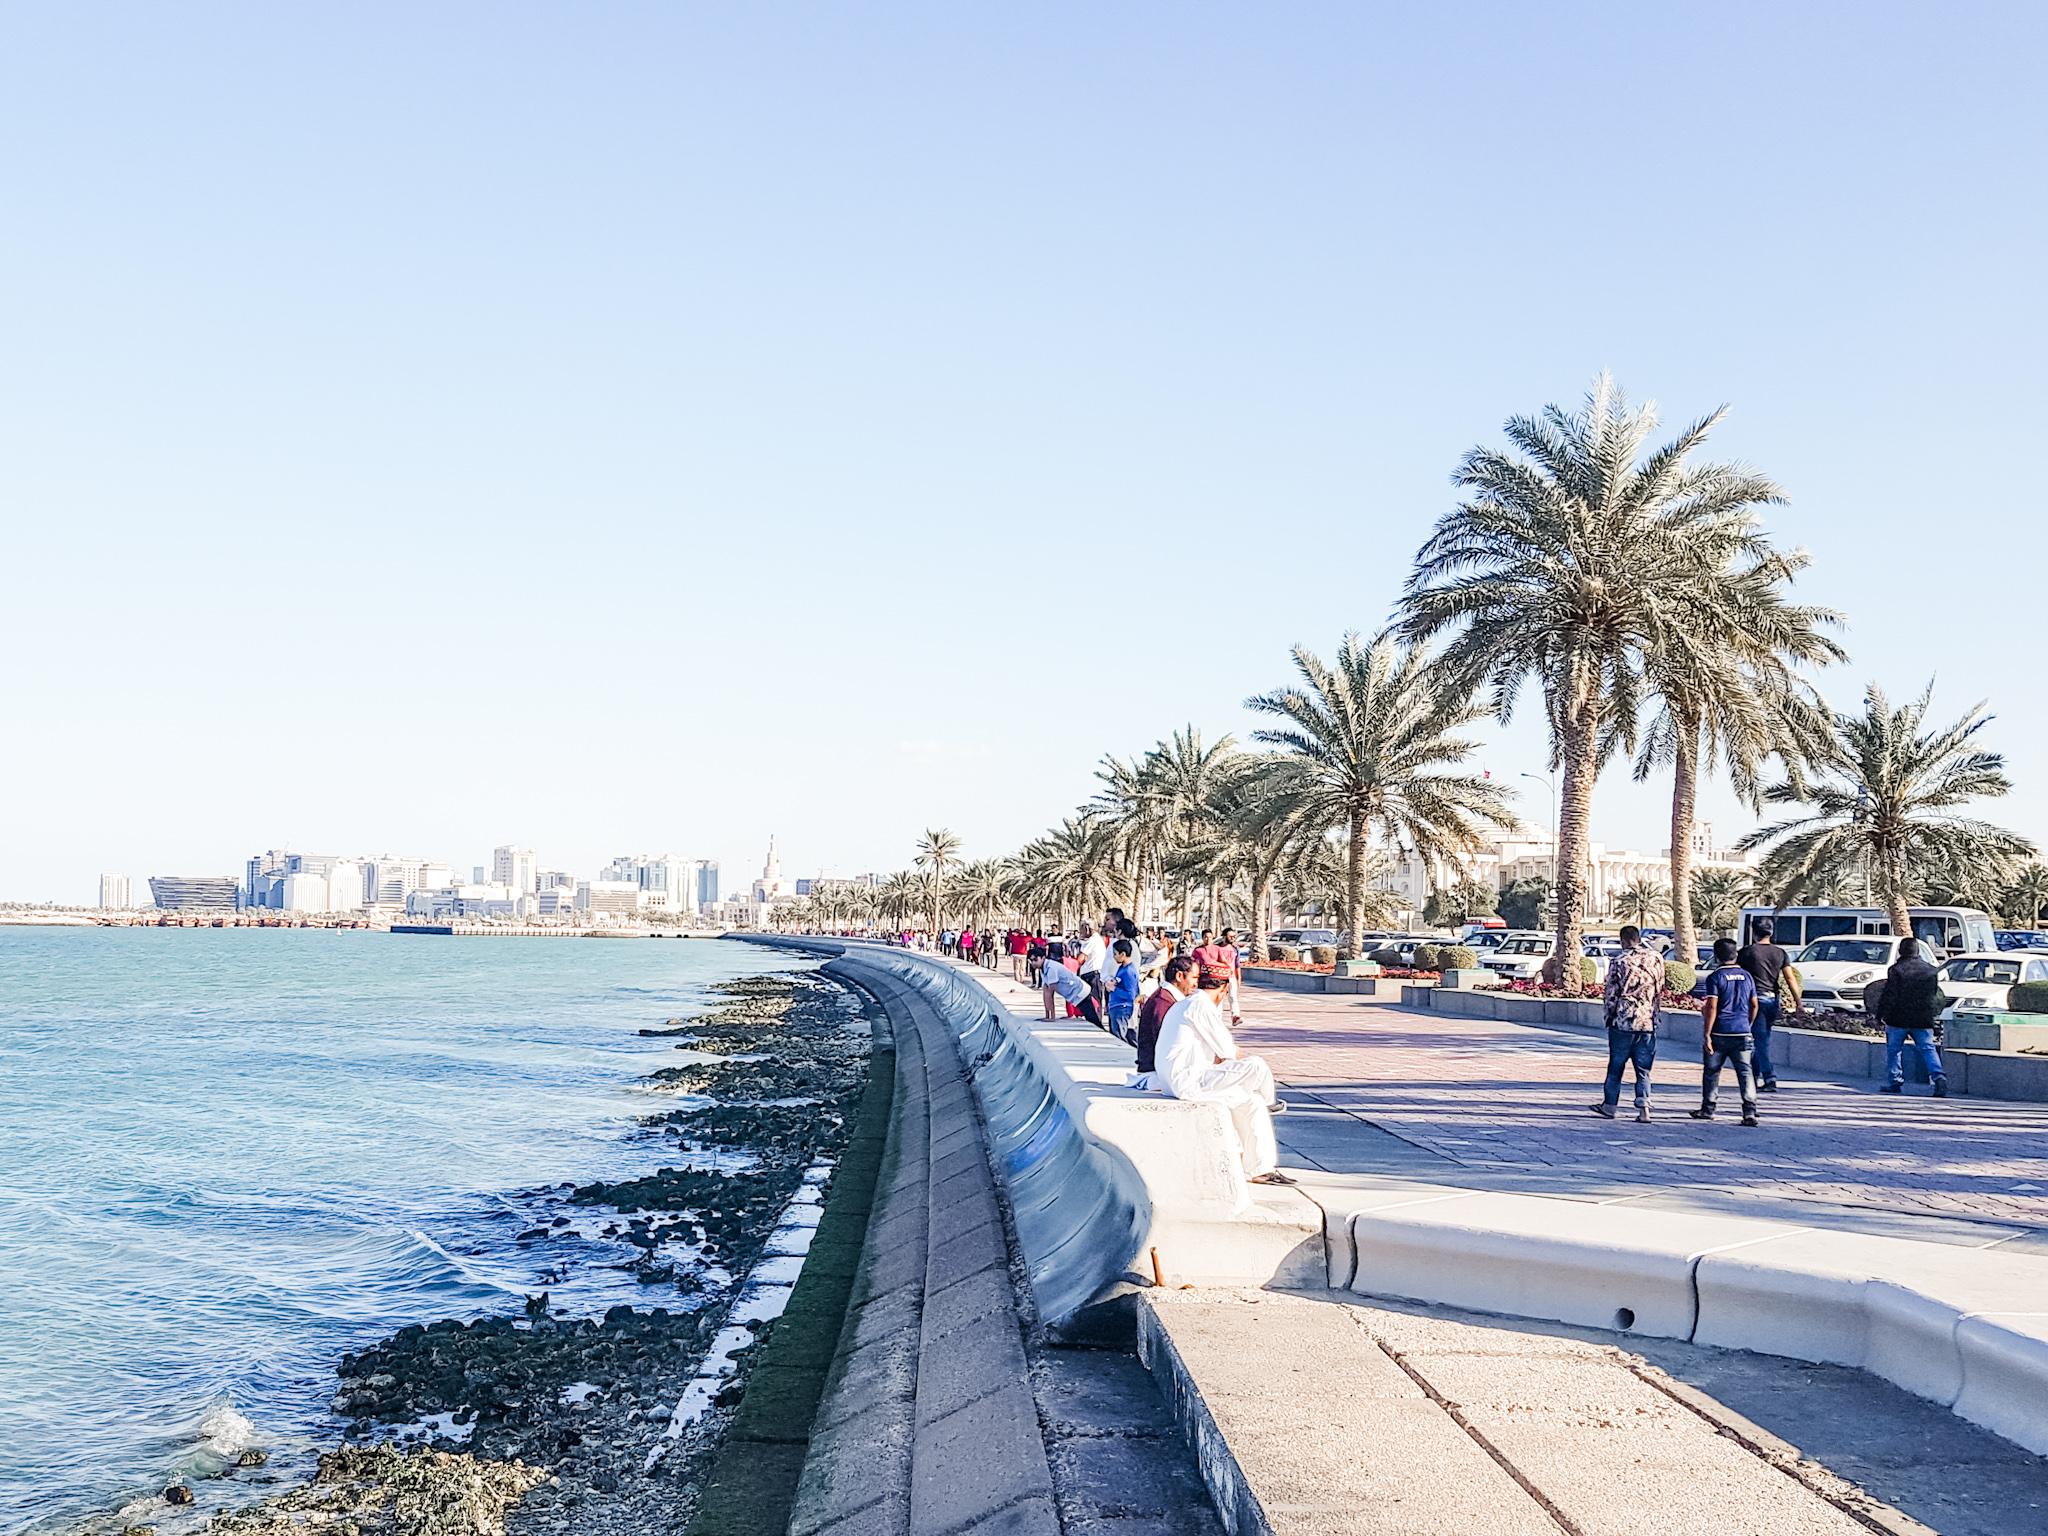 Finding a job in Qatar.